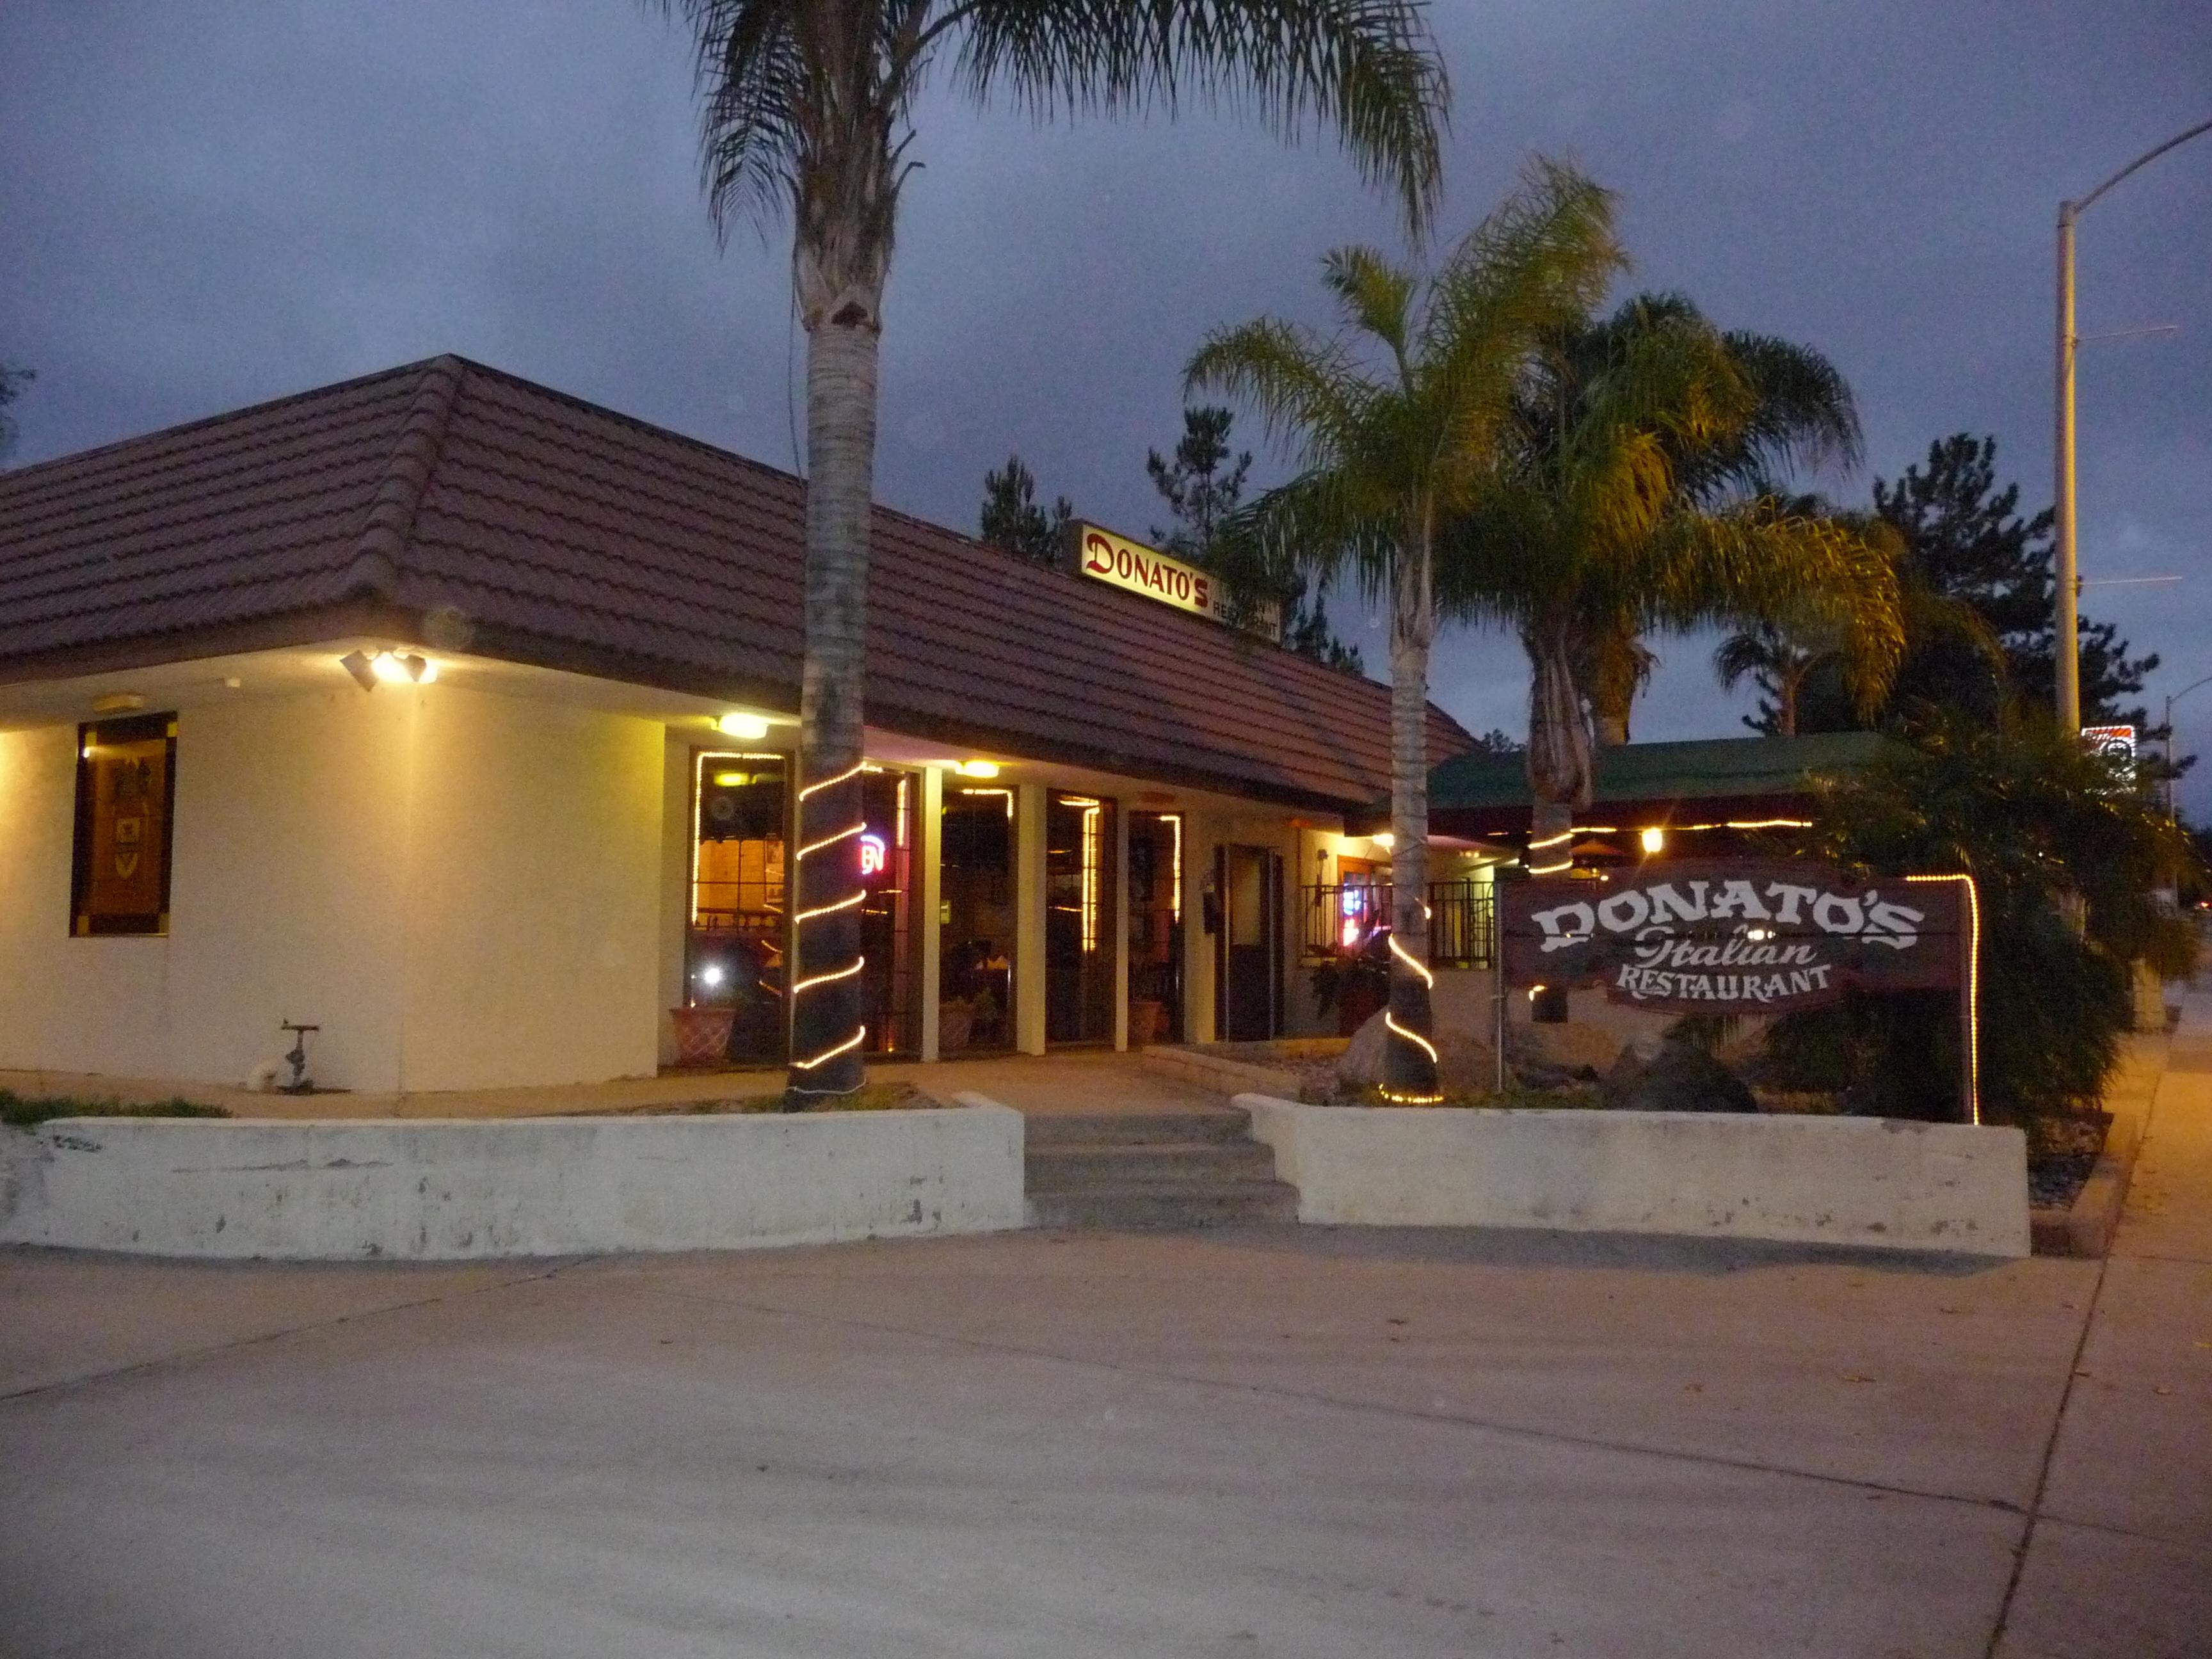 Donato's Italian Restaurant, Alpine CA